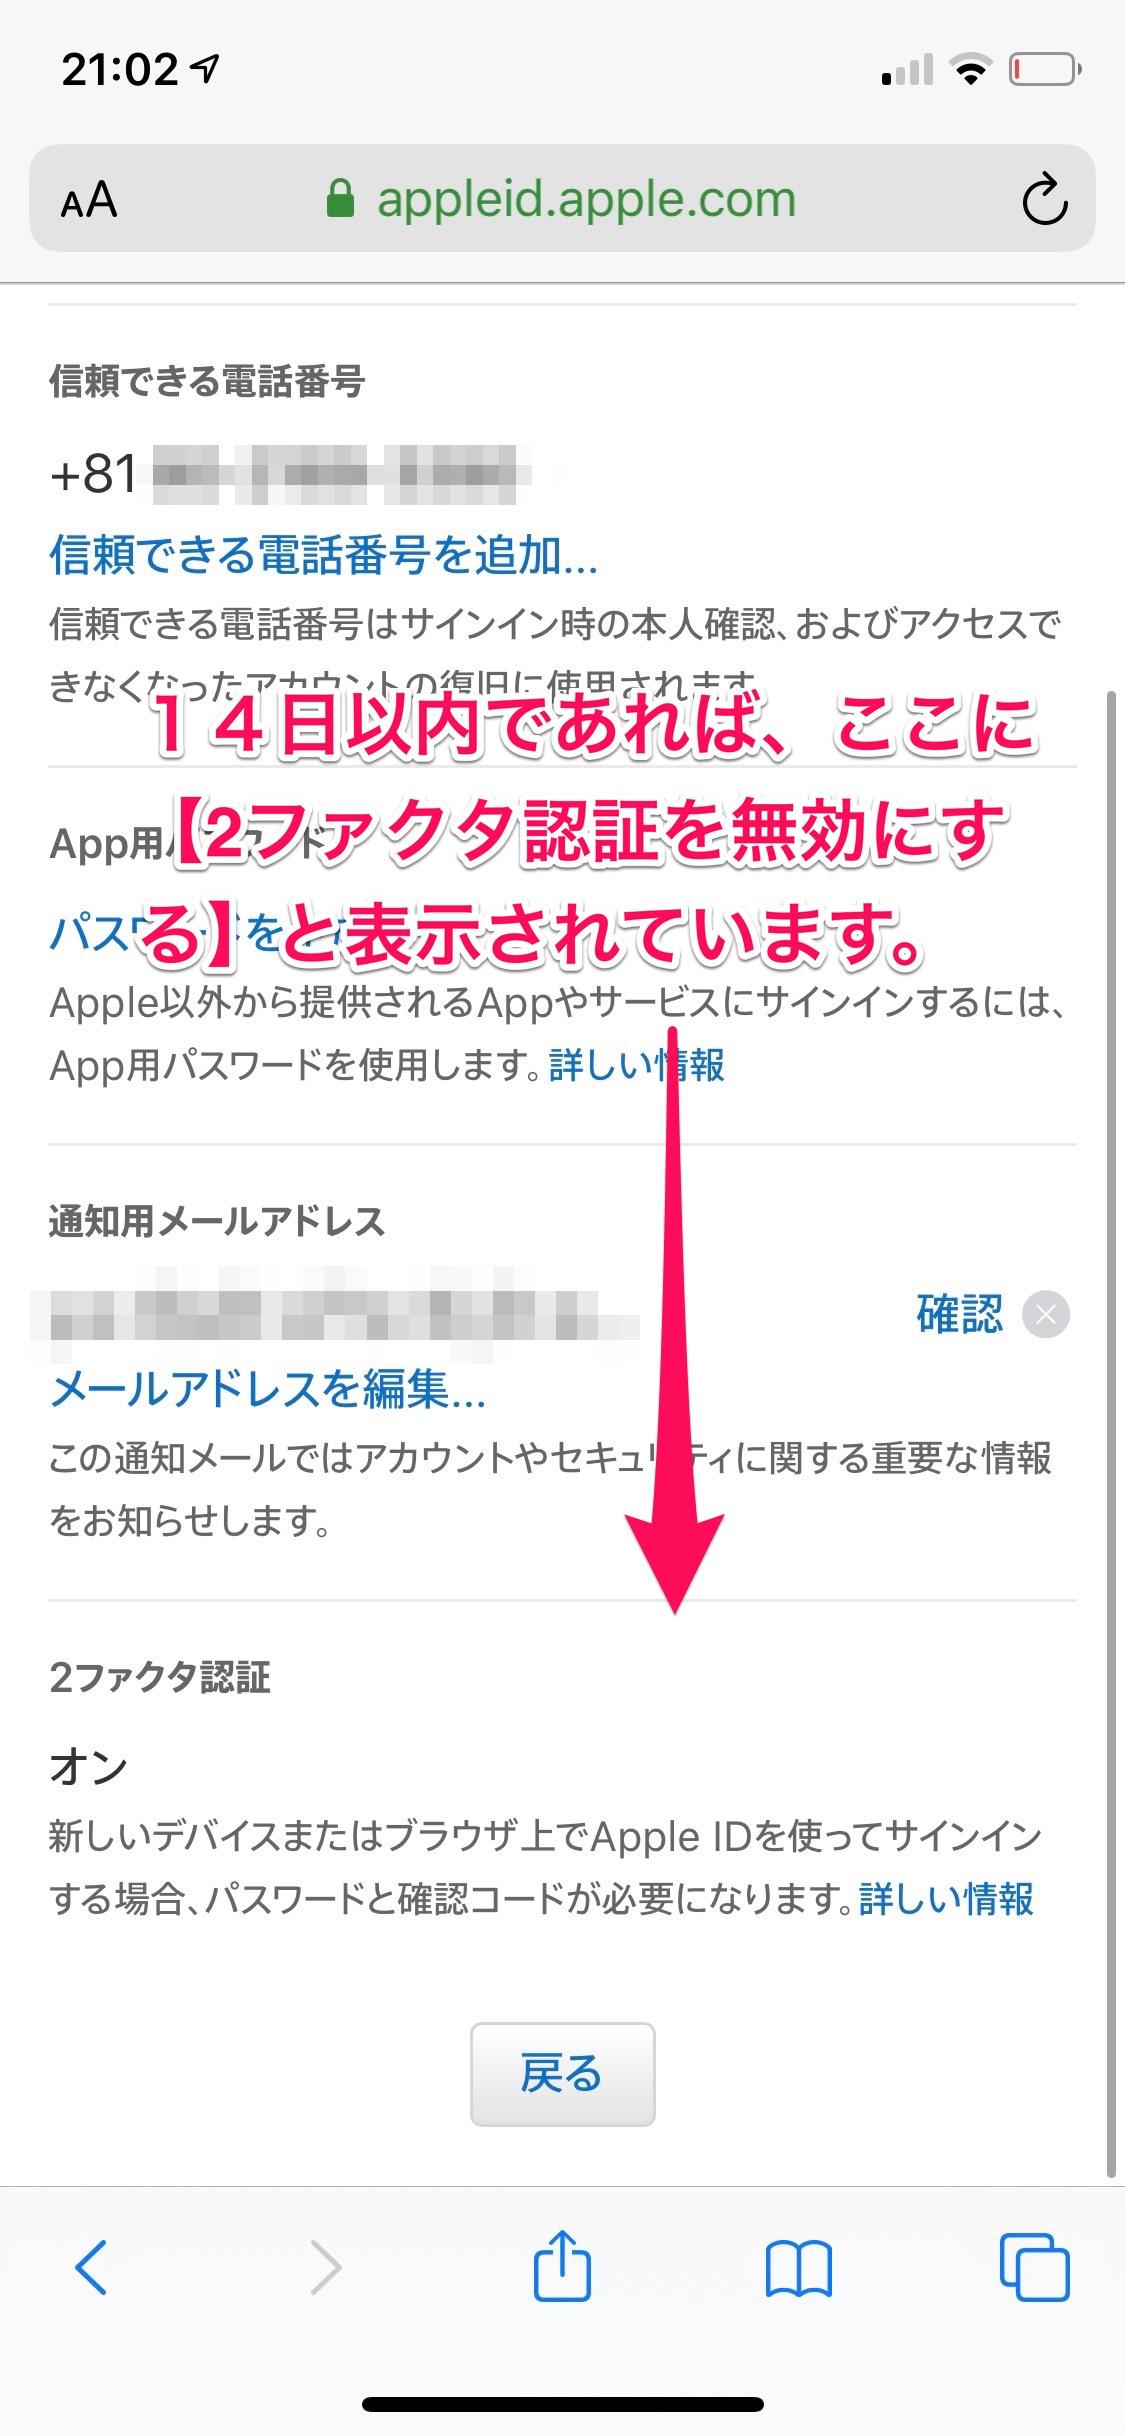 AppleID セキュリティ 2ファクタ無効